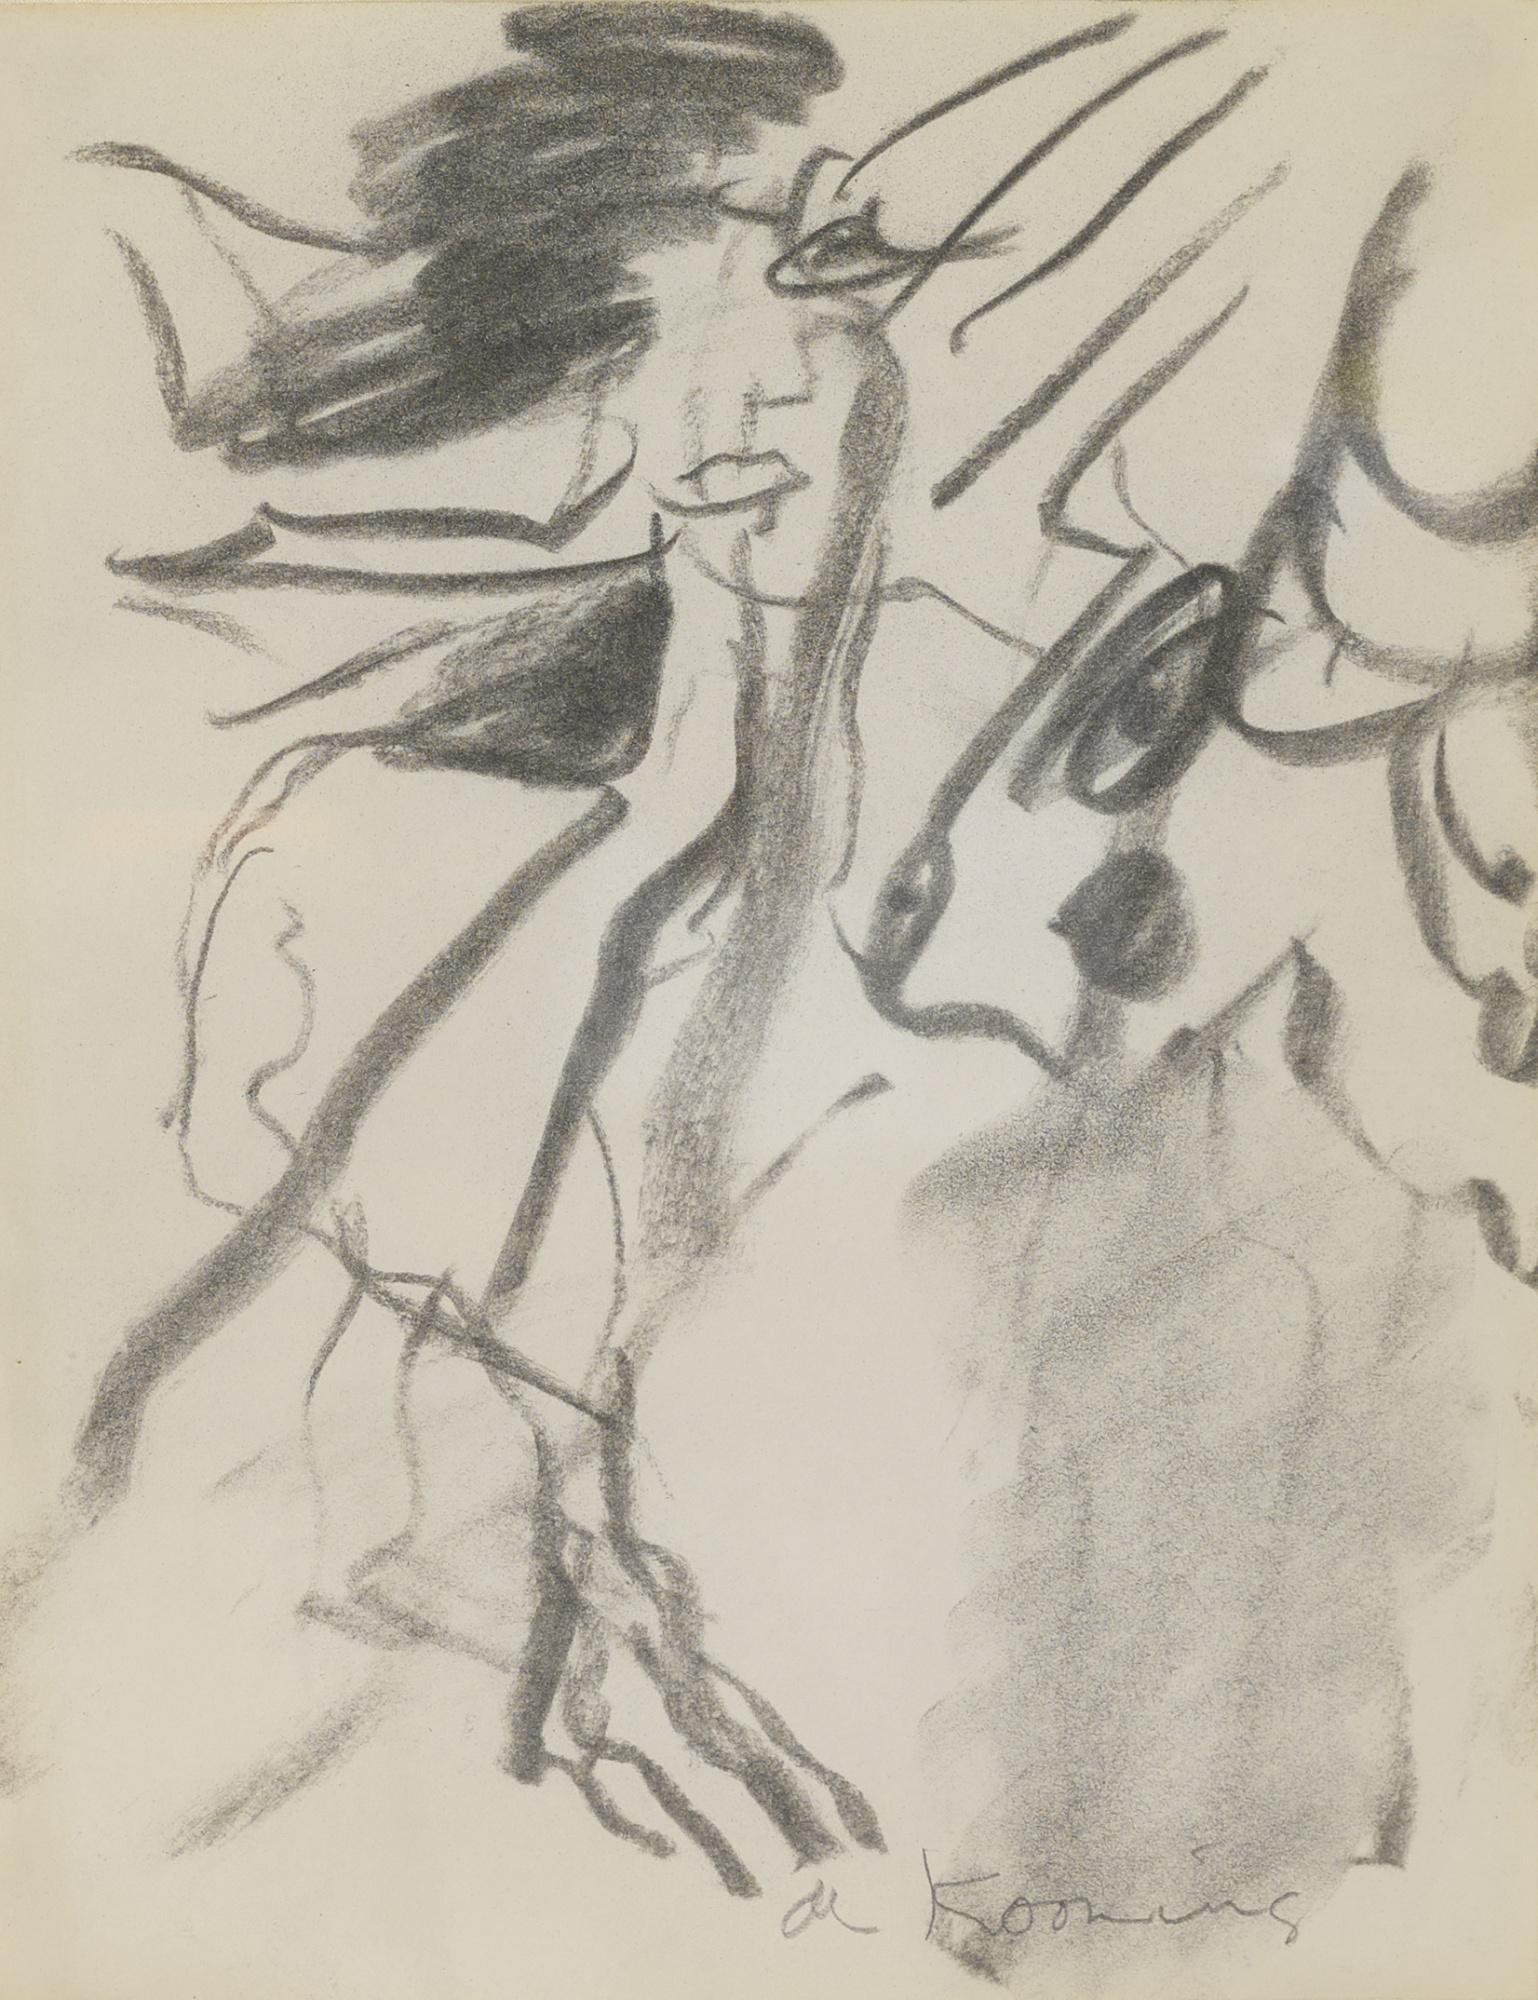 Willem de Kooning-Untitled-1965